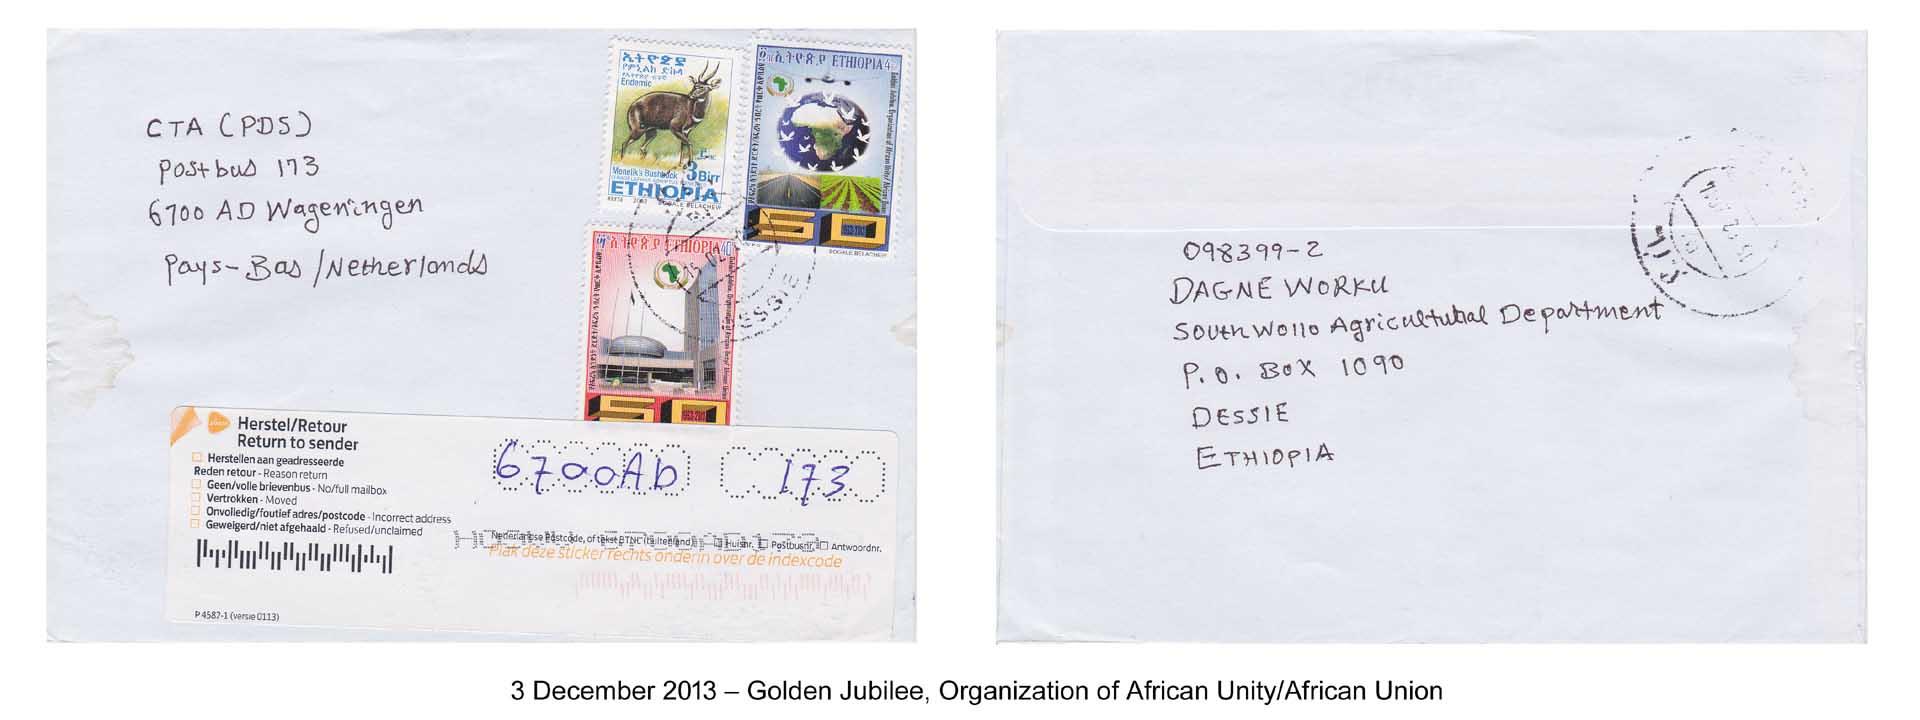 20131203 – Golden Jubilee, Organization of African Unity